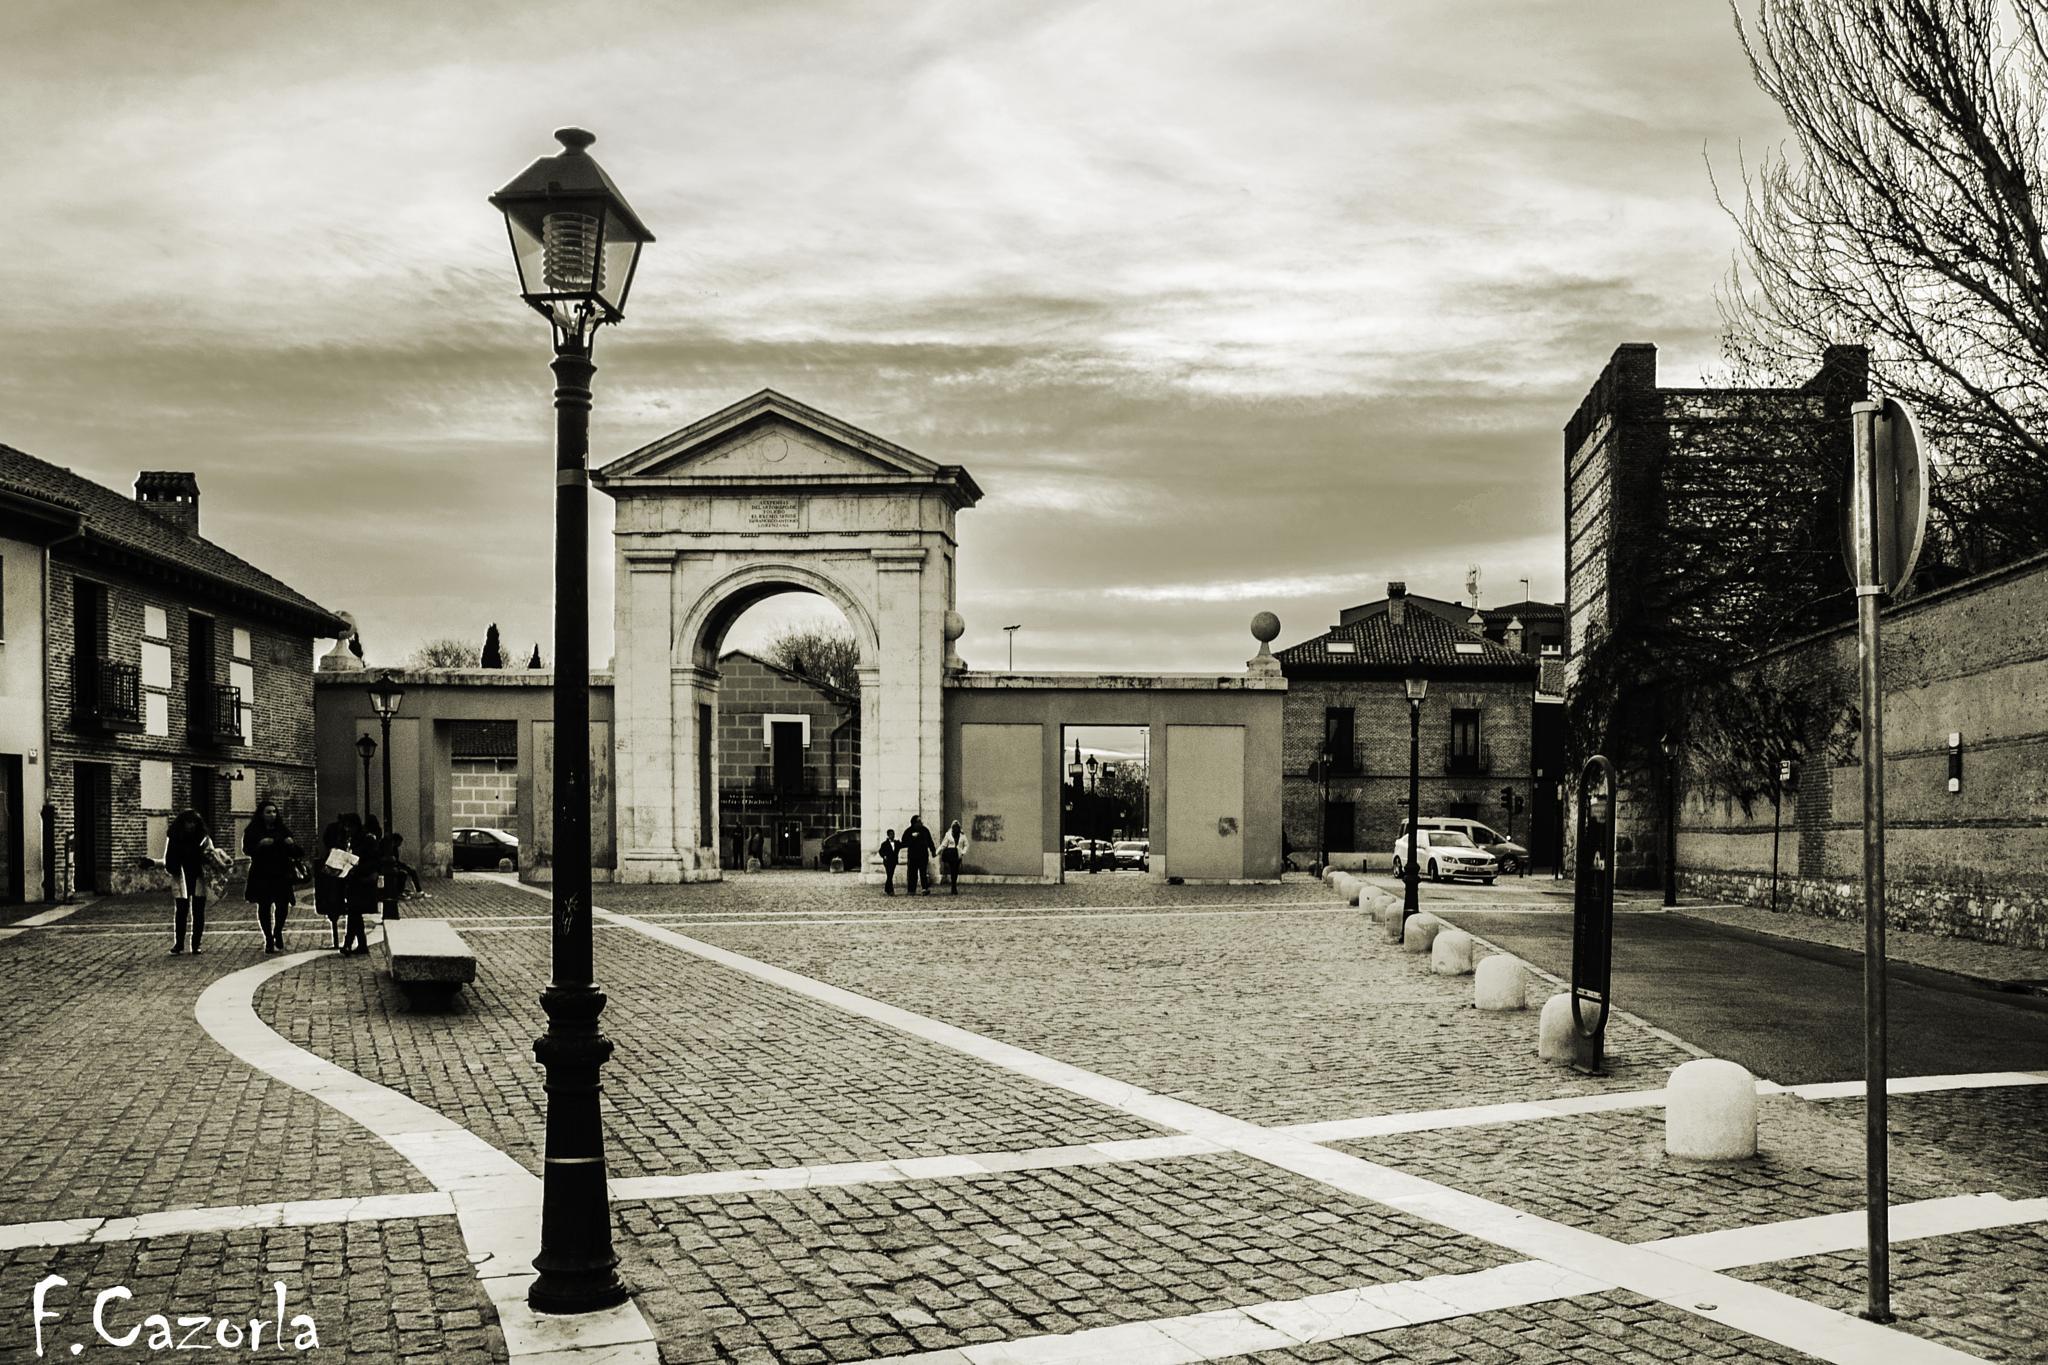 Puerta de Madrid, en Alcalá de Henares. b/n by Félix Cazorla